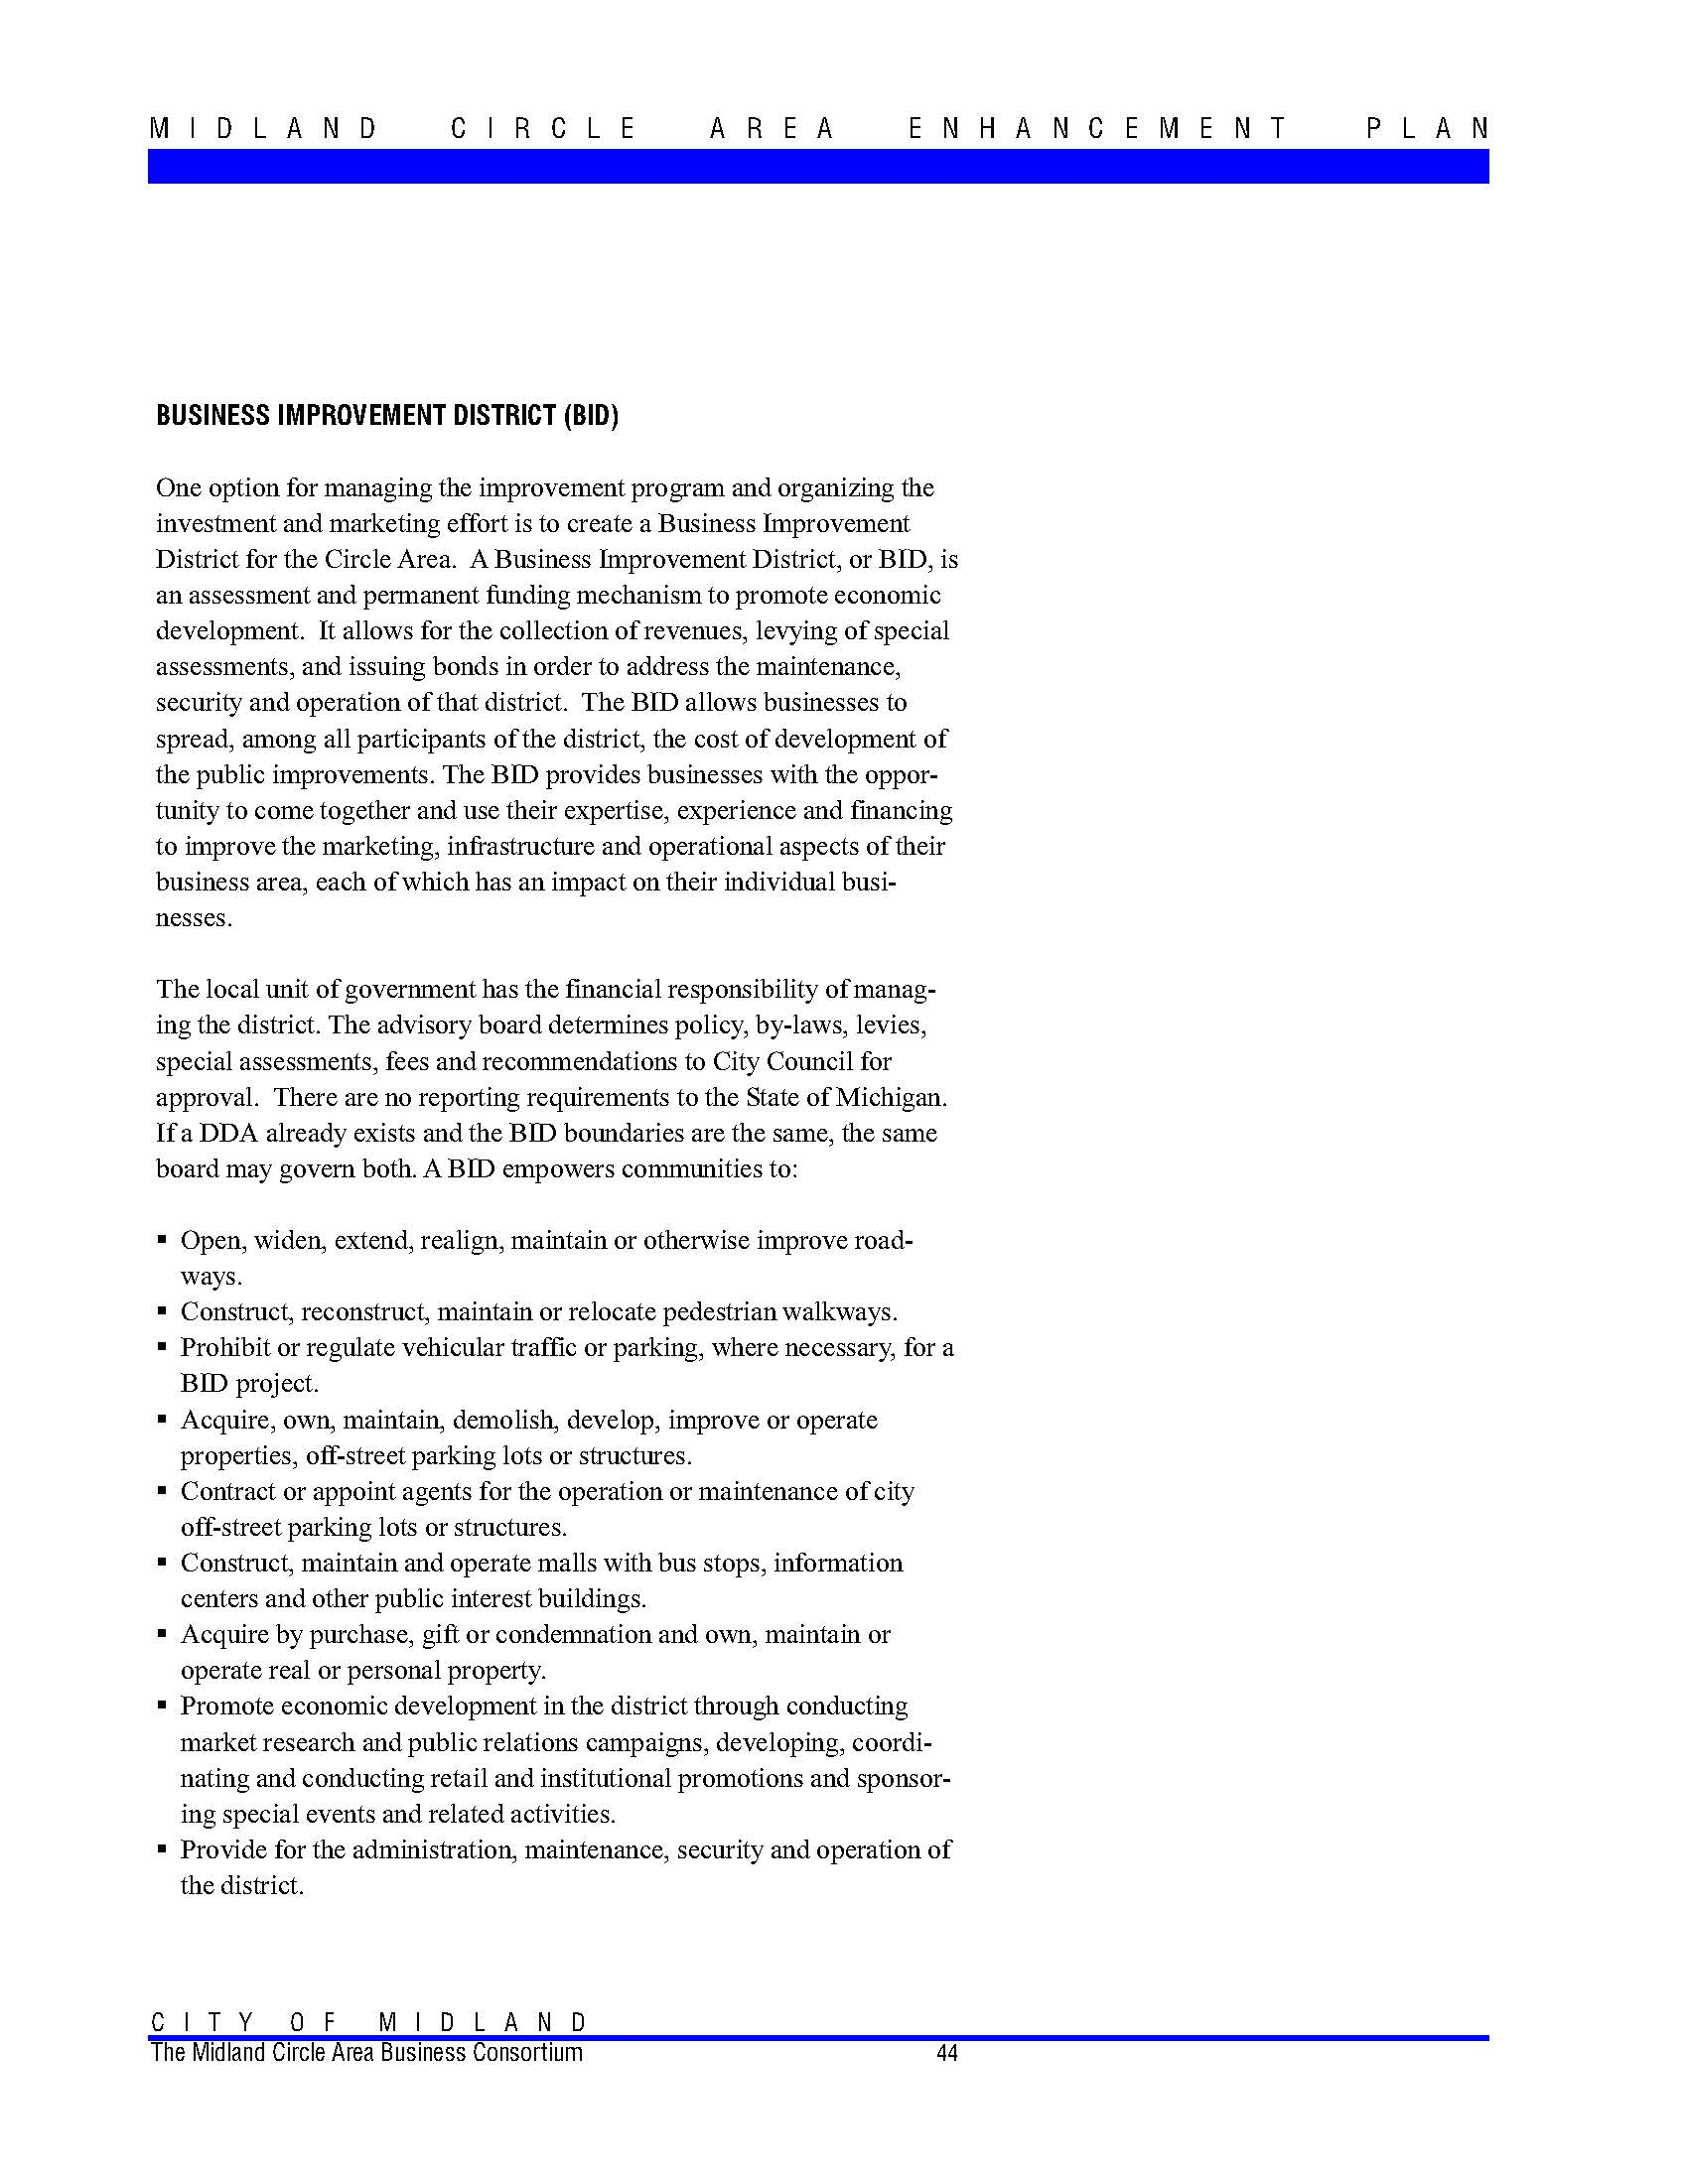 Ashman Circle Enhancement Plan_Page_46.jpg